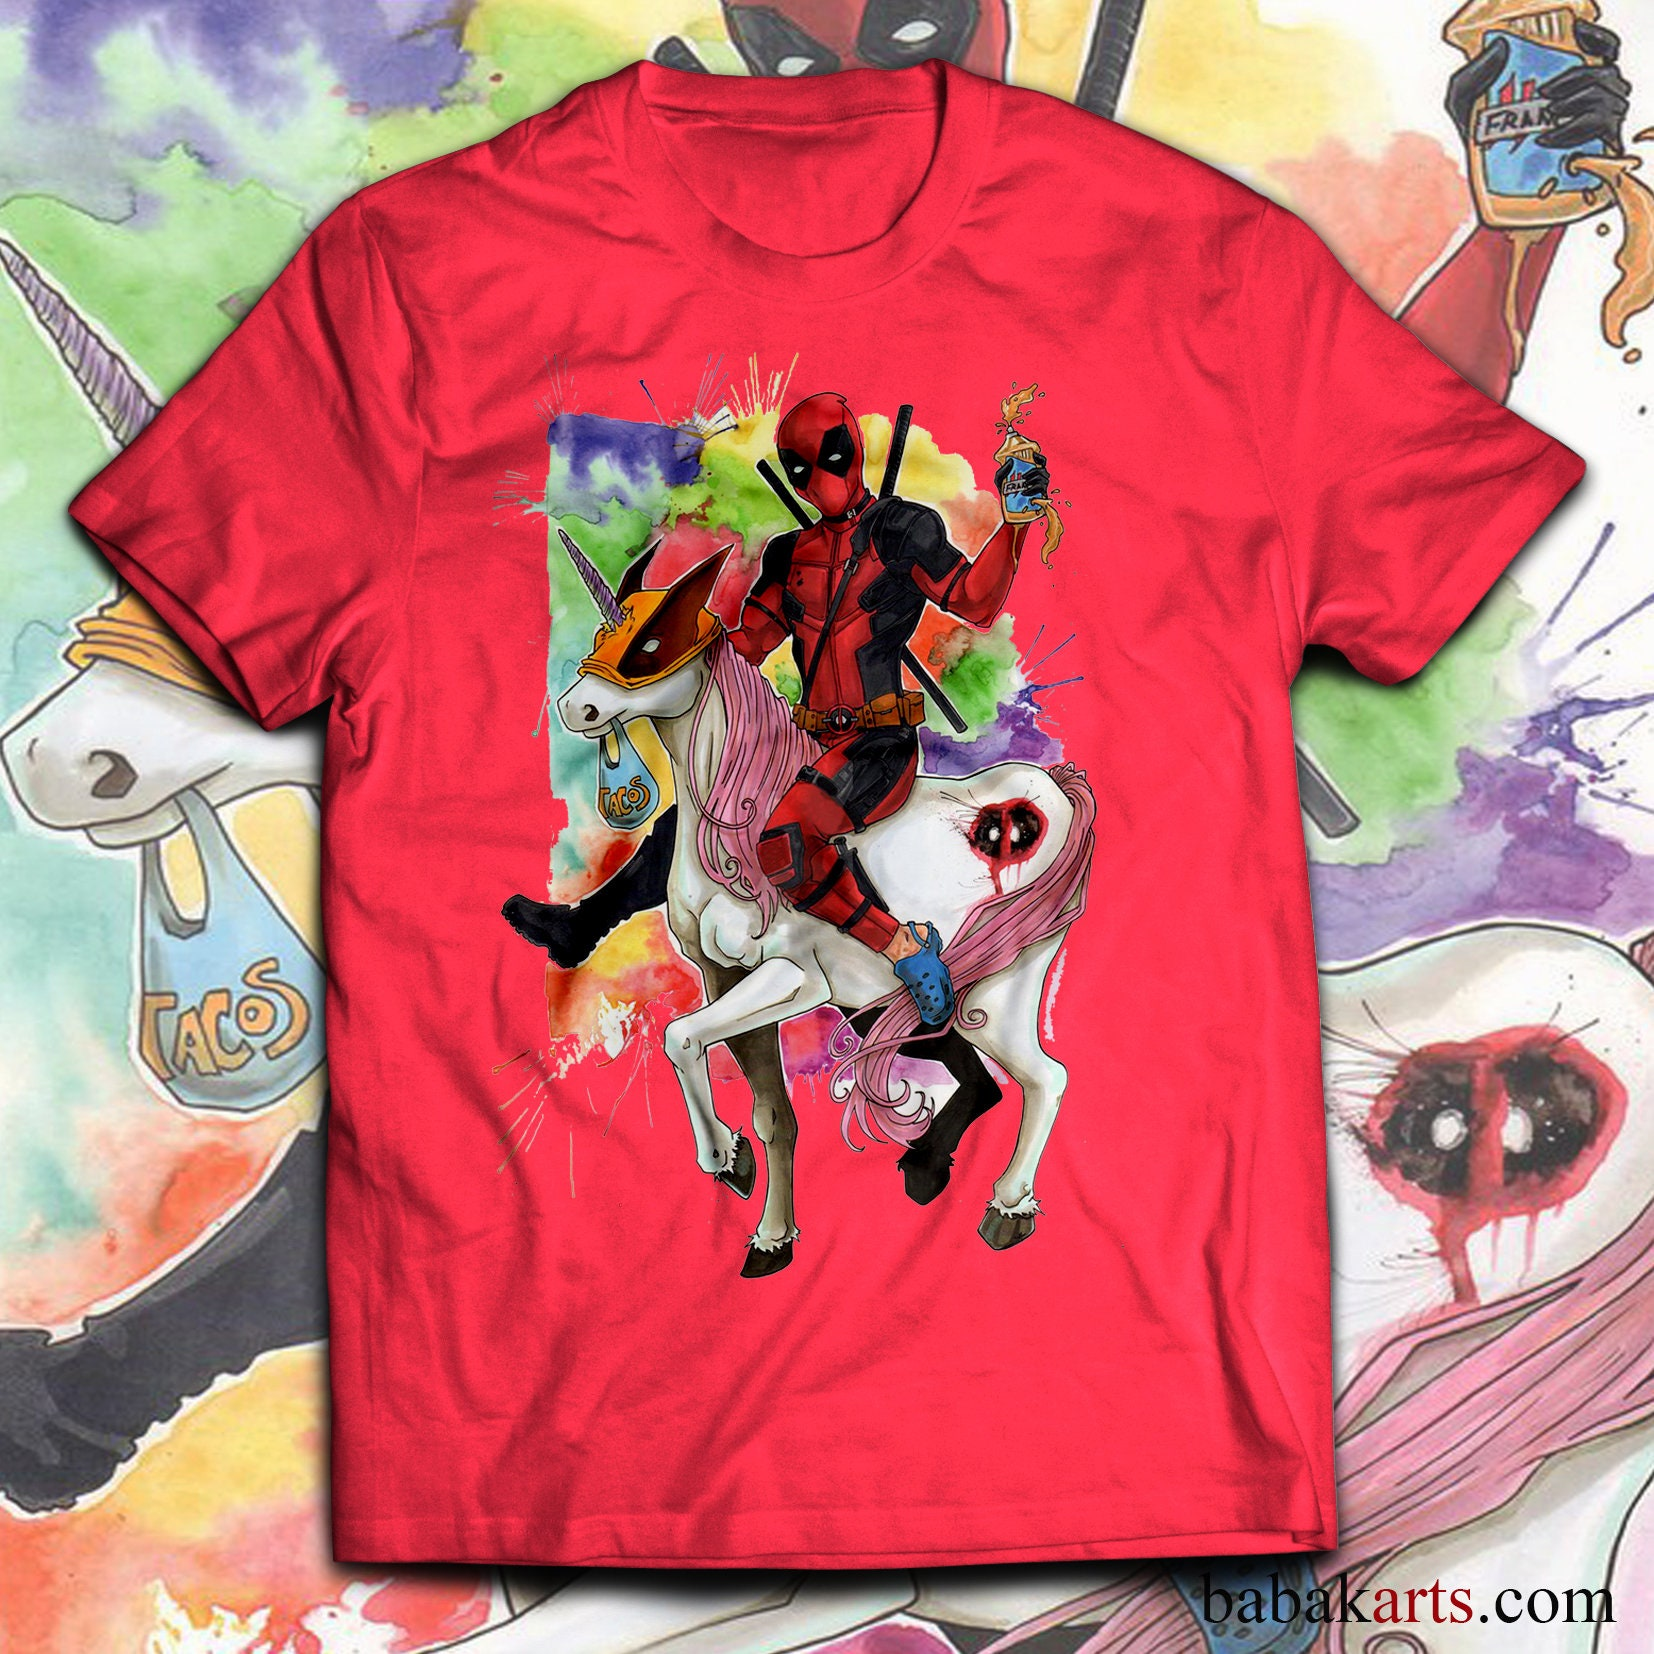 1a2b196e6b2a Deadpool T-Shirts - deadpool T-Shirt - Marvel Deadpool t shirt - Deadpool  party shirt - Deadpool tee